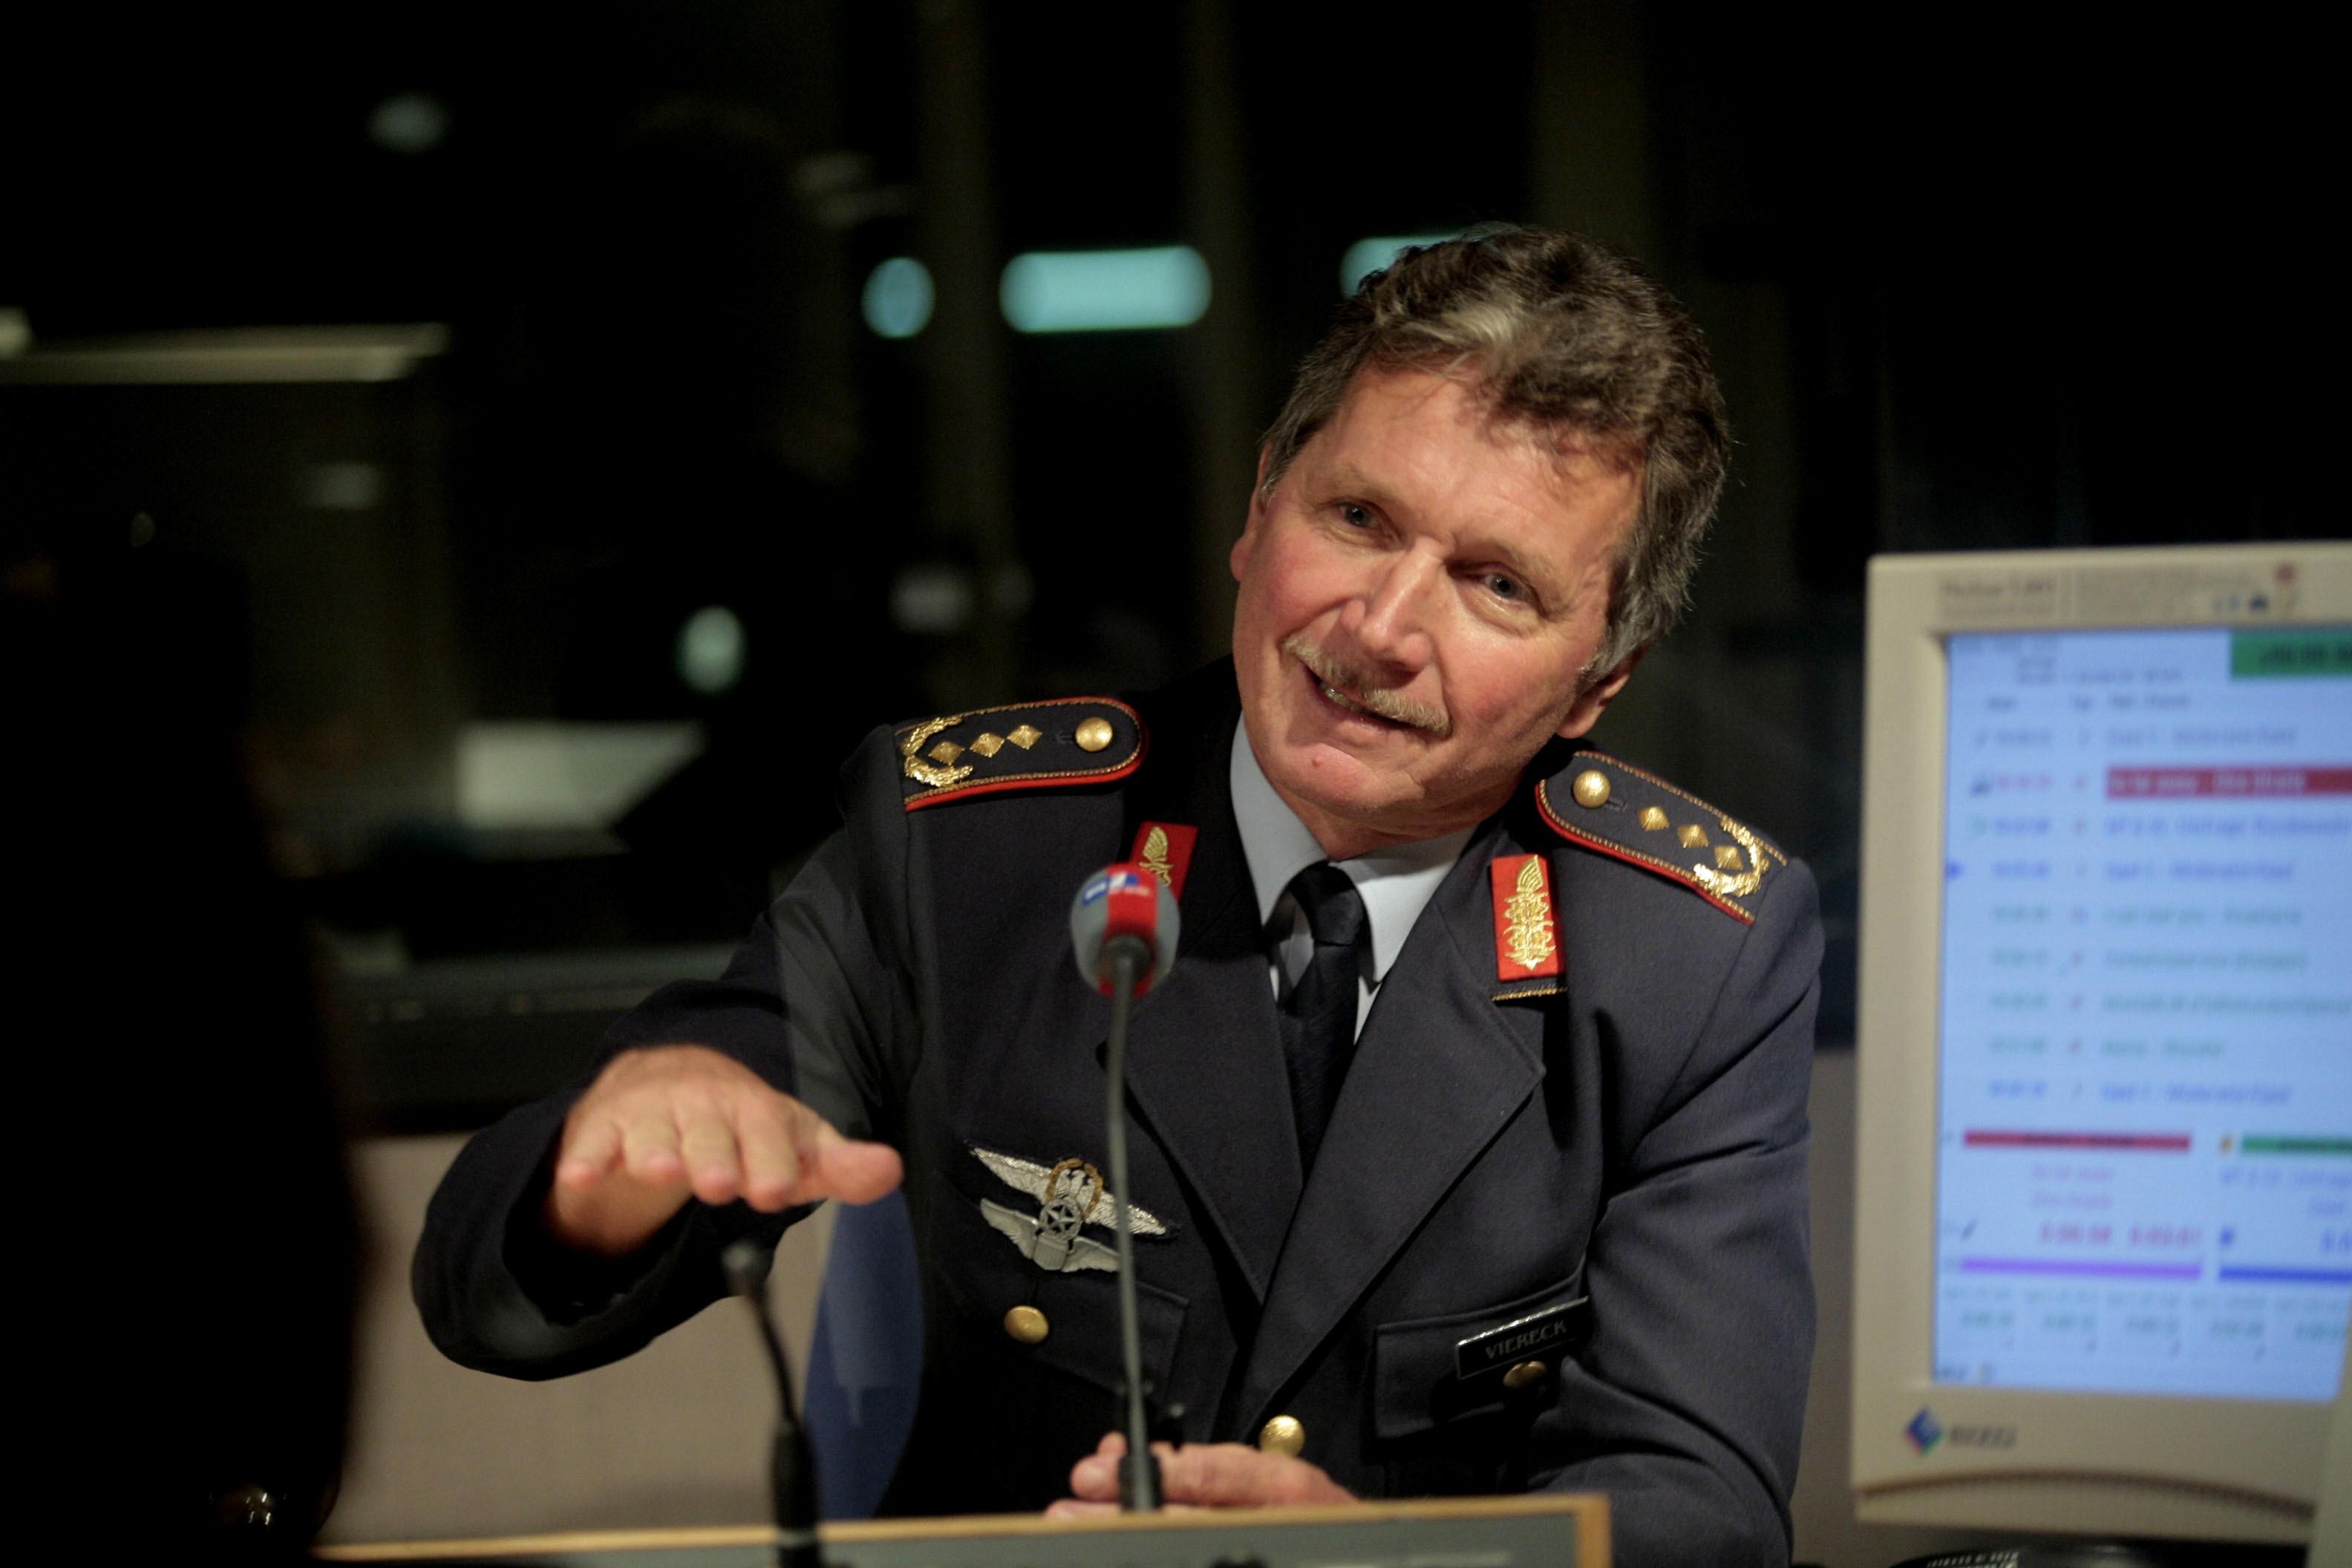 Foto: WDR